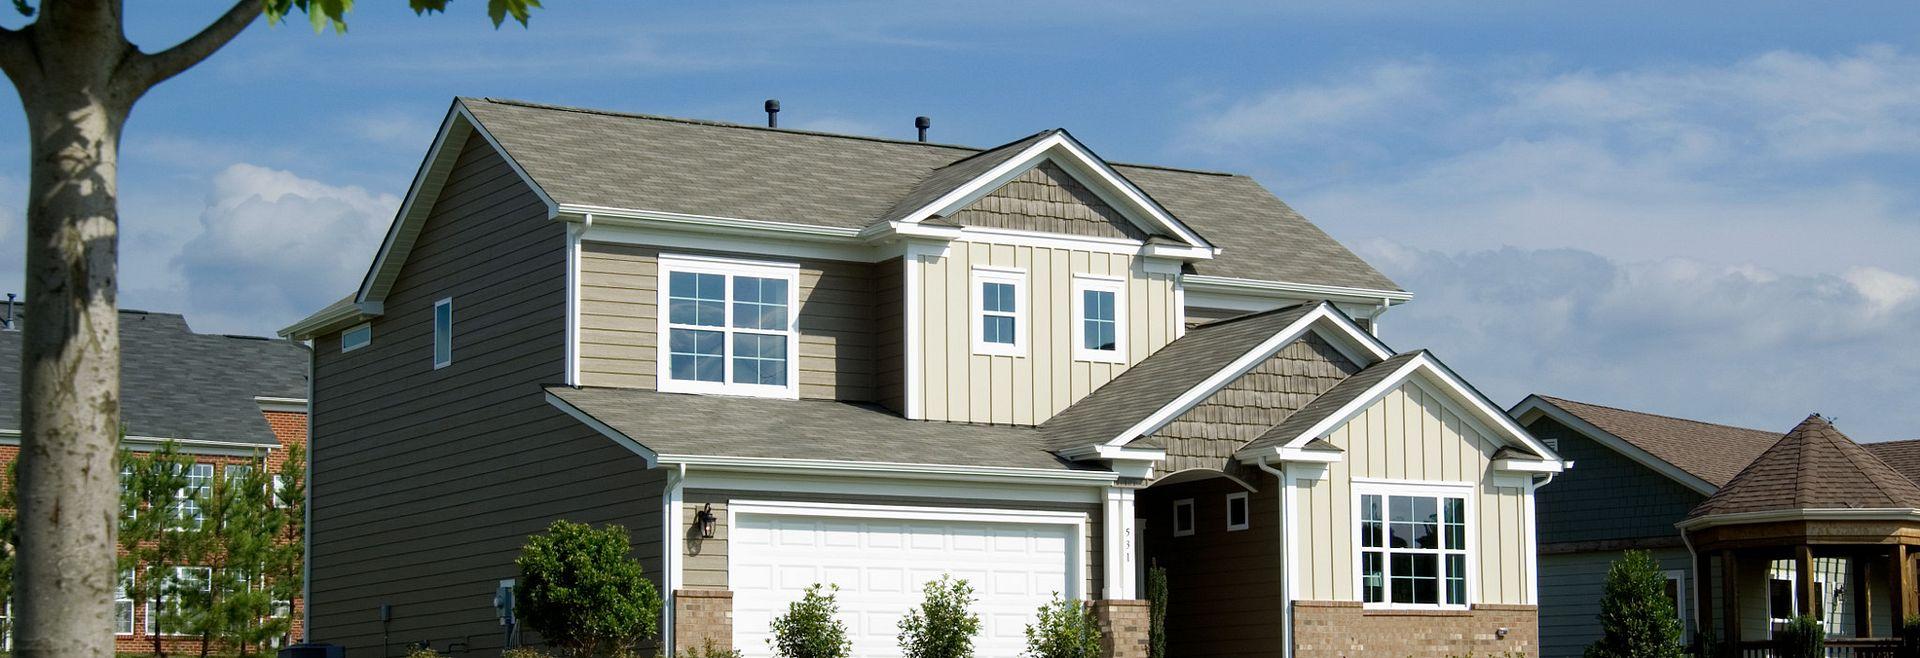 Lantana by Shea Homes in Charlotte, NC